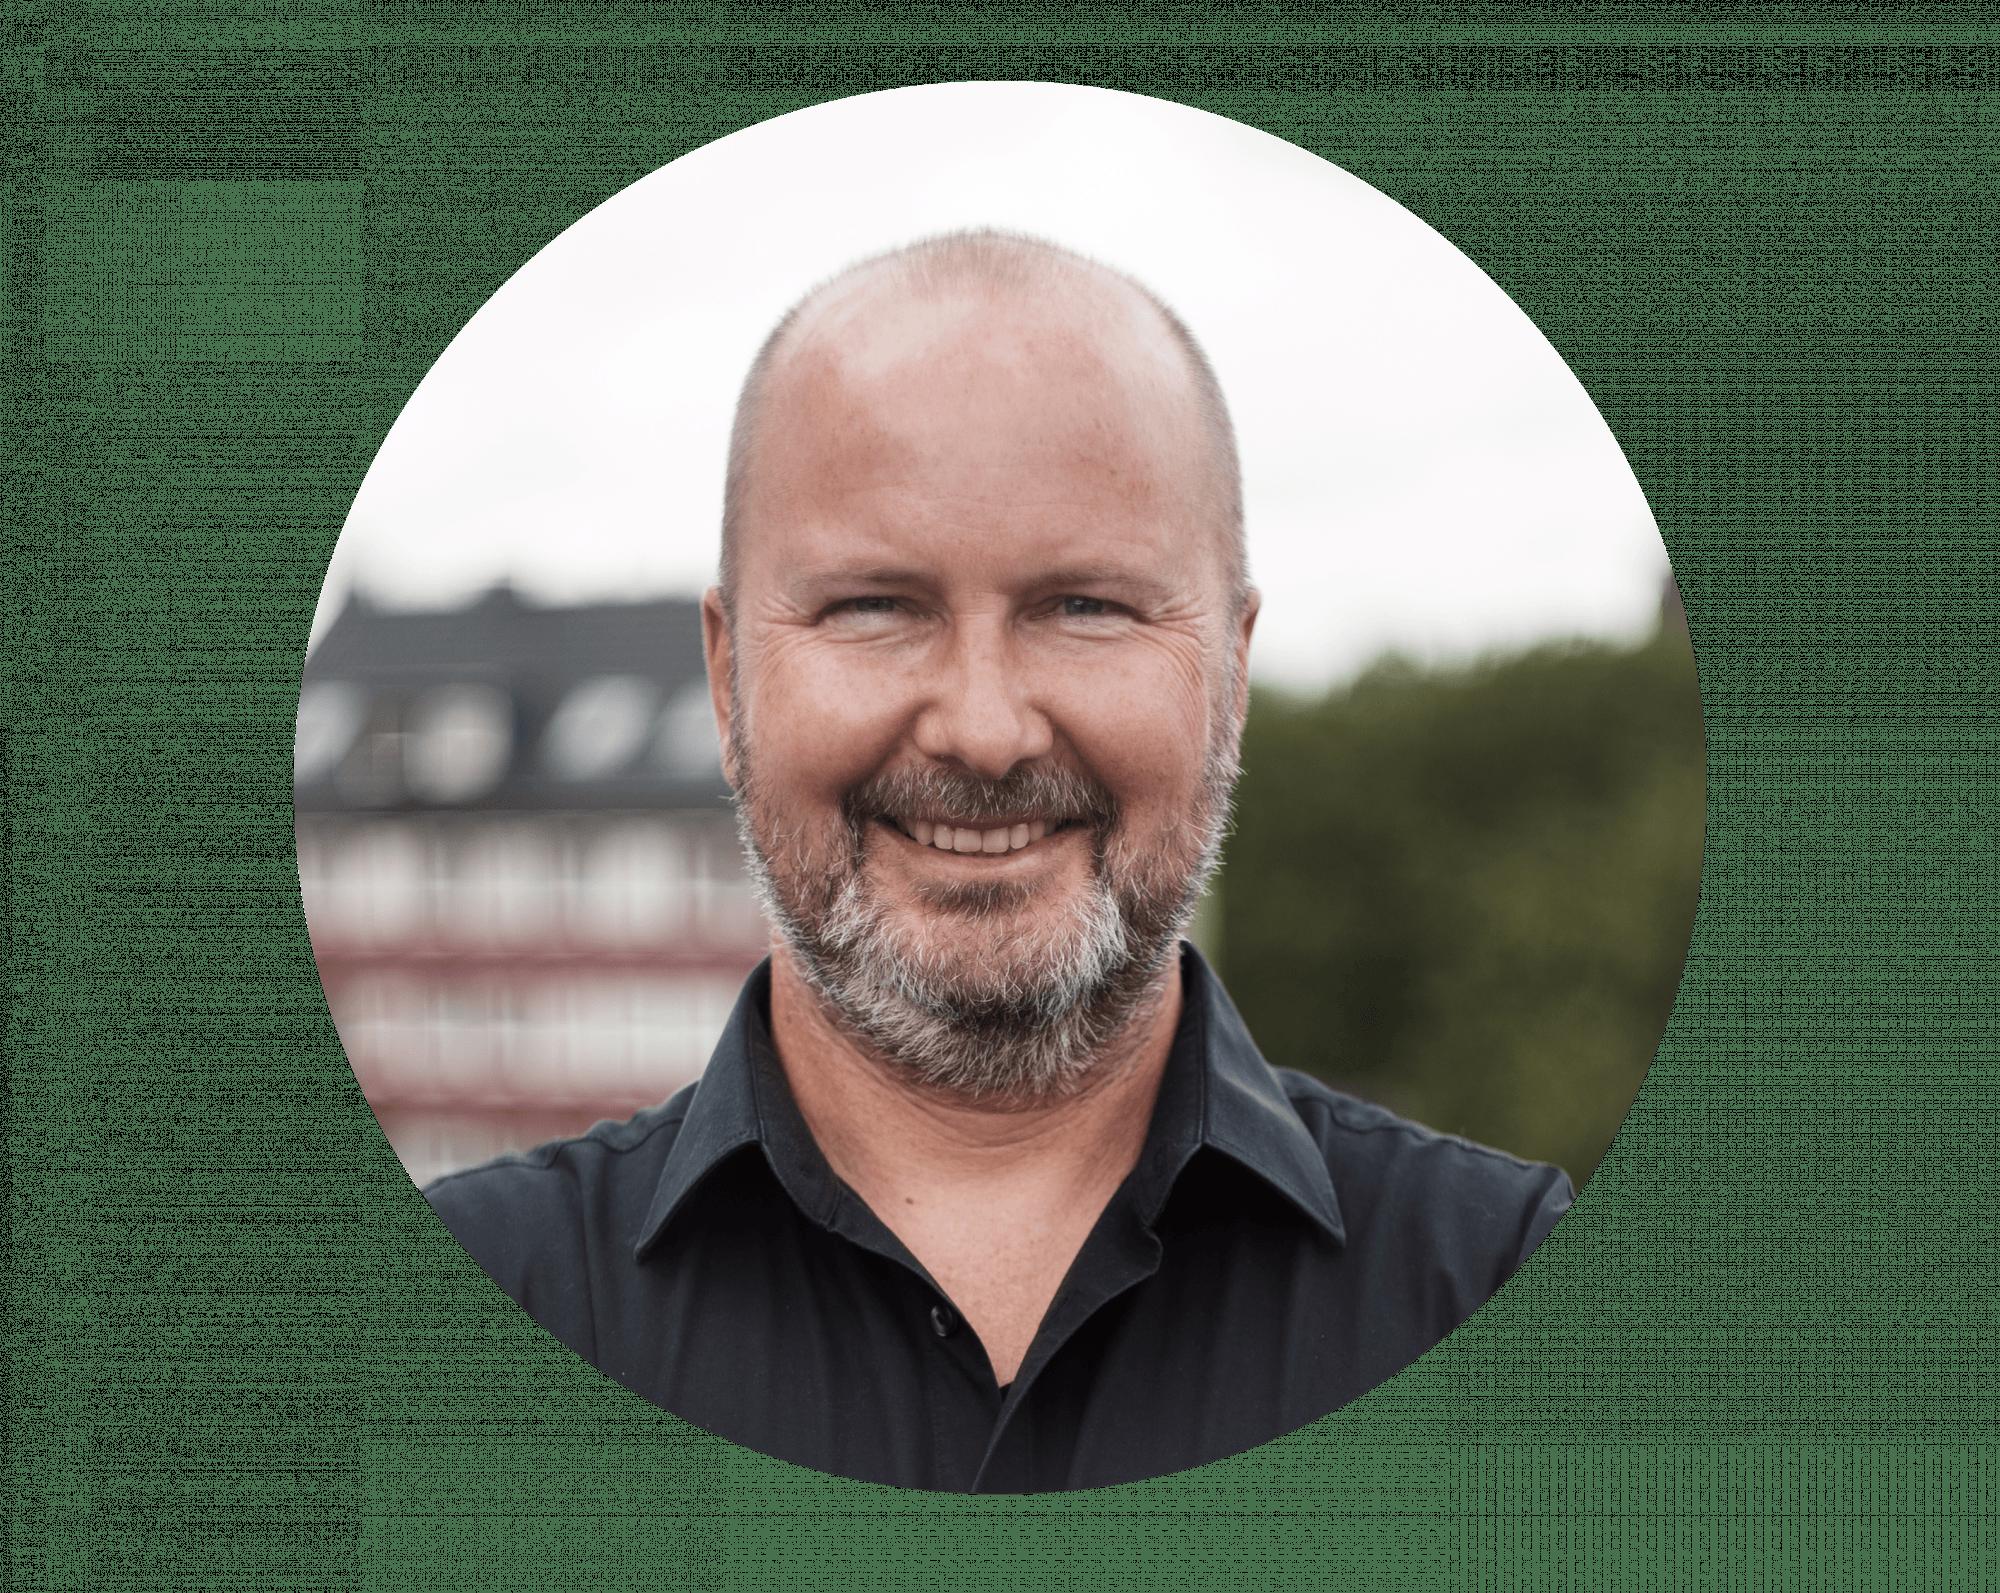 Holger Boyne, Head of Digital, Eintracht Frankfurt